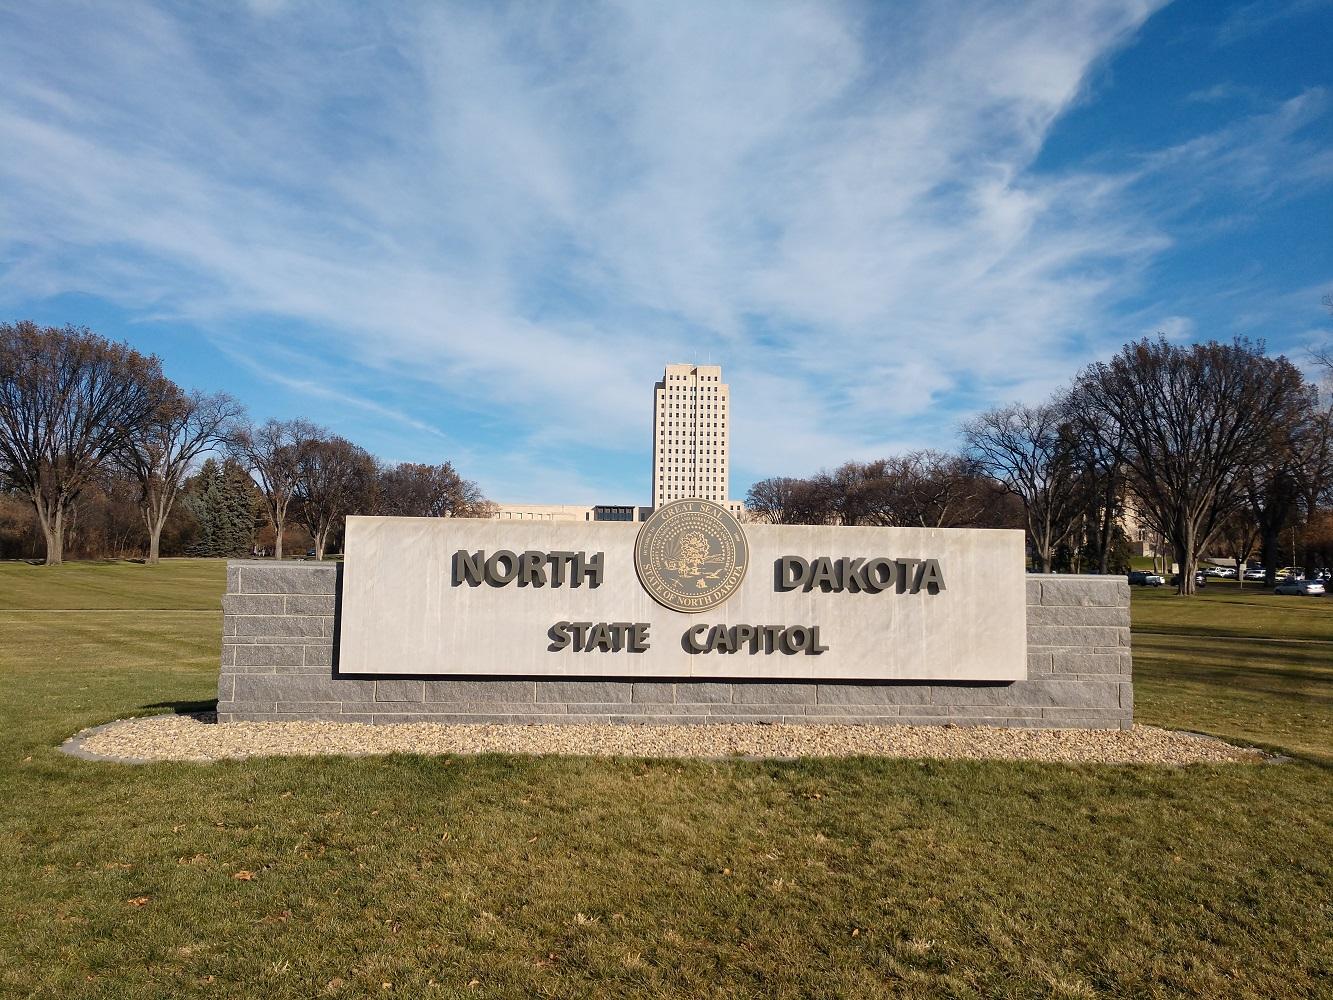 North Dakota State Capital, Signage Front